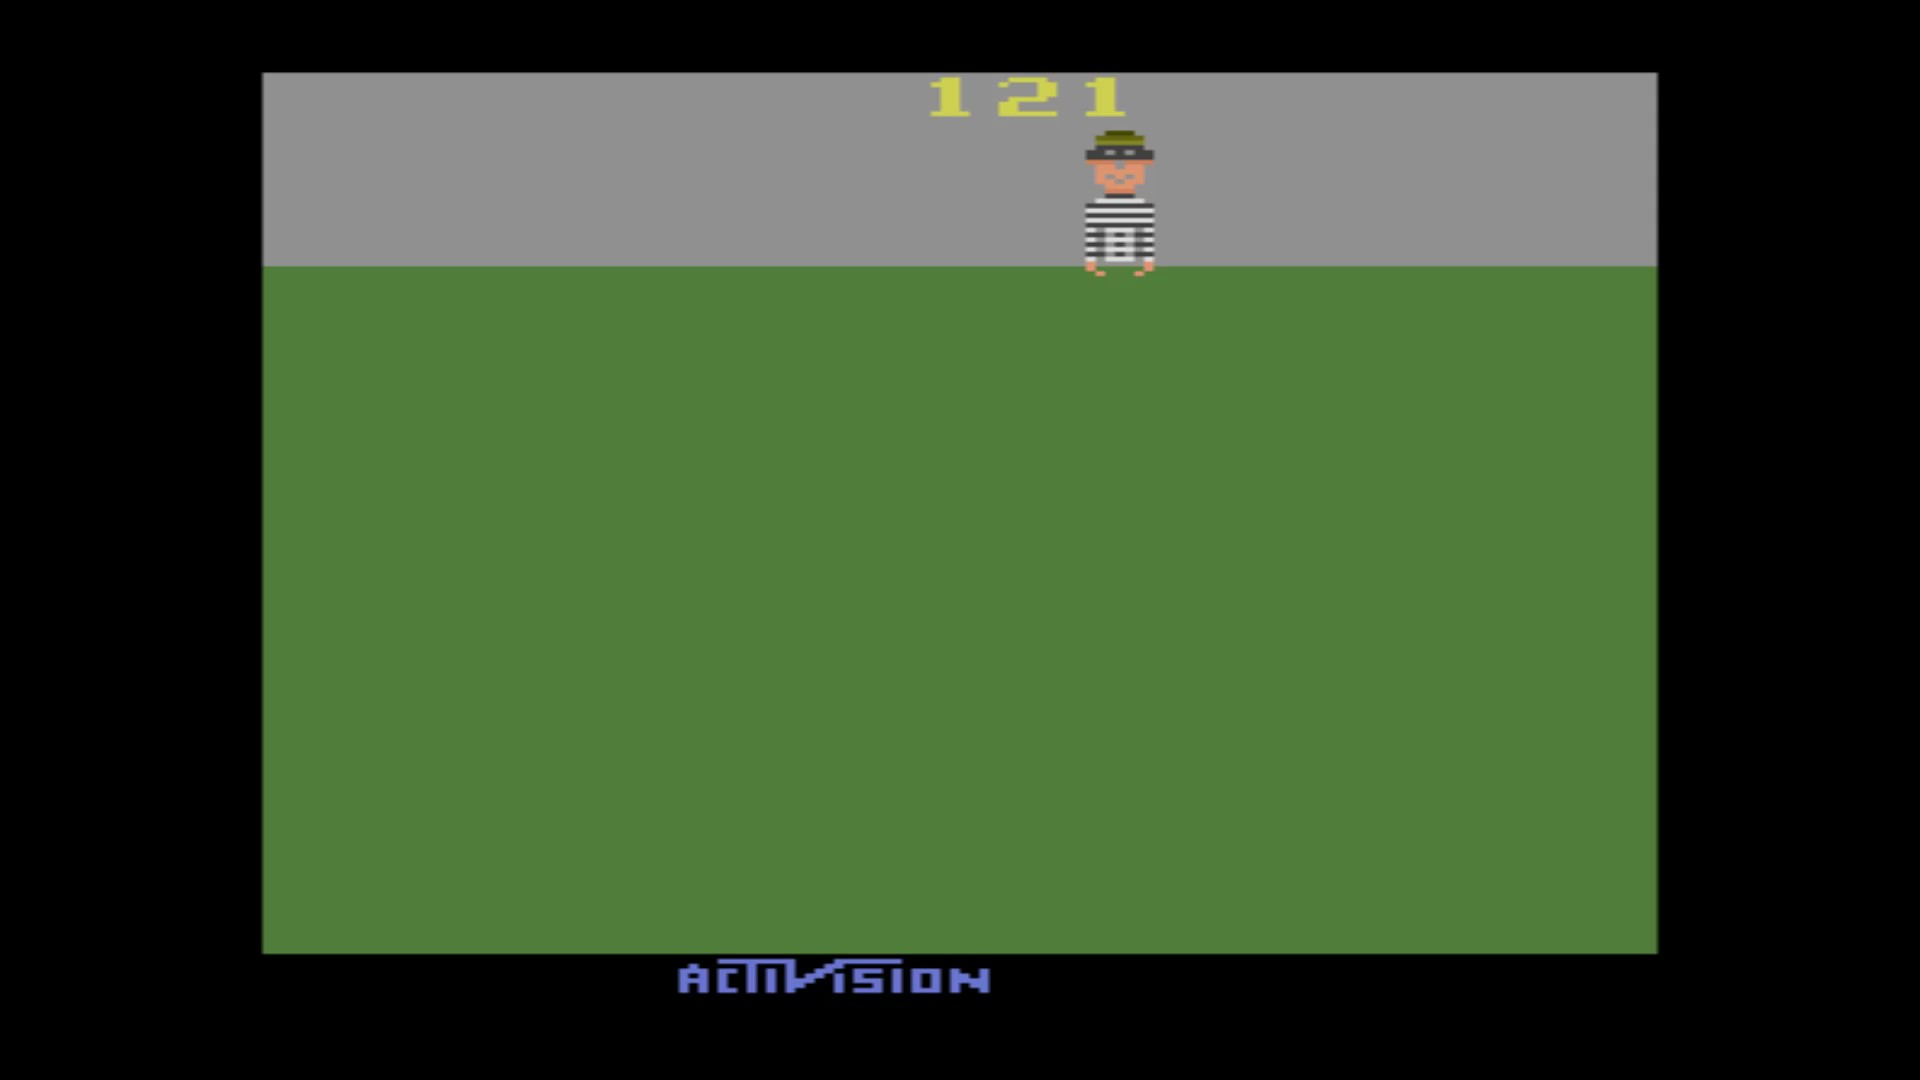 AkinNahtanoj: Kaboom! (Atari 2600 Emulated Novice/B Mode) 121 points on 2020-08-15 02:54:55